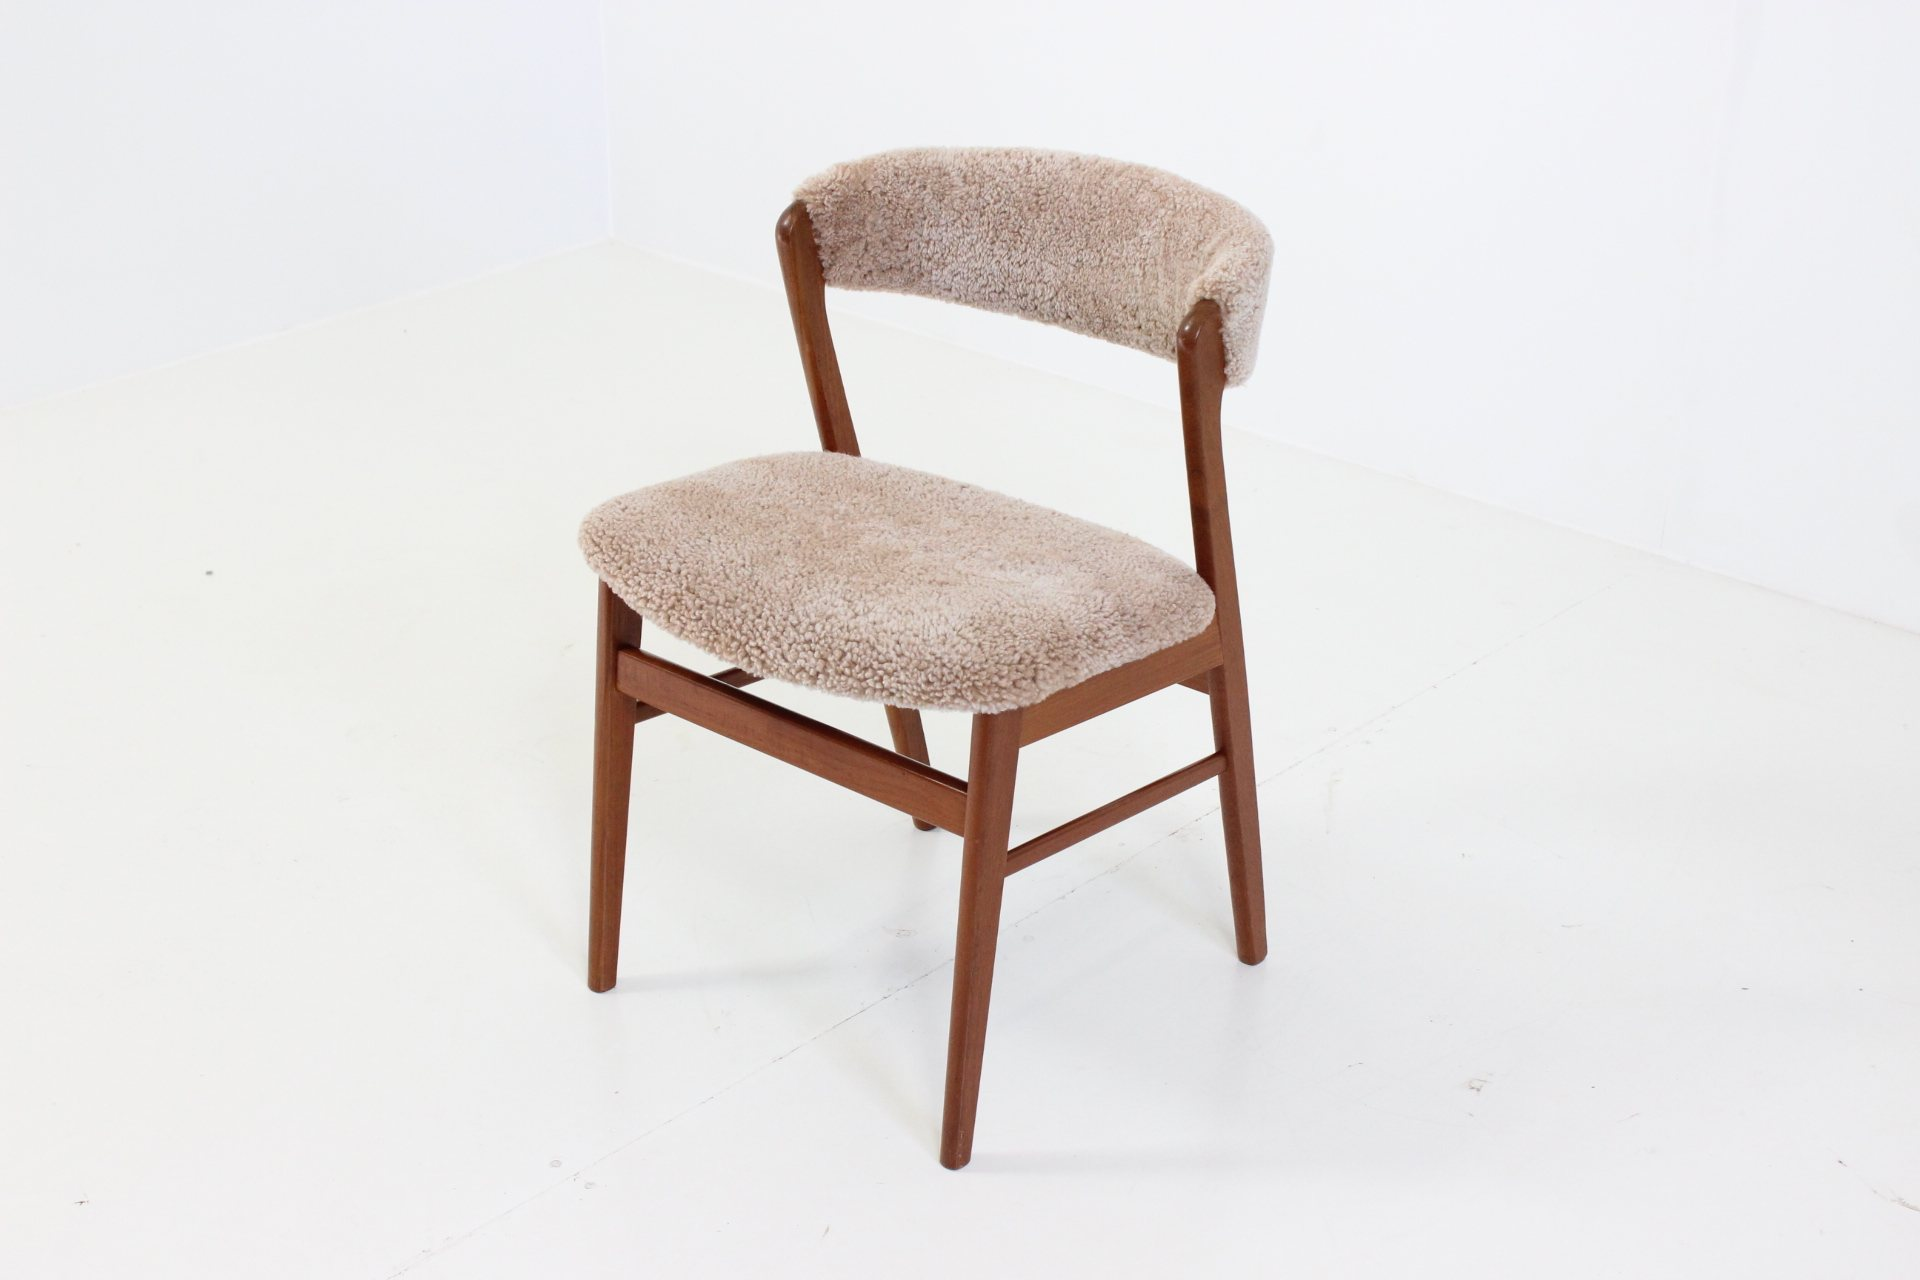 Side chair by kai kristiansen for h ng stolefabrik davint design - Kai kristiansen chair ...